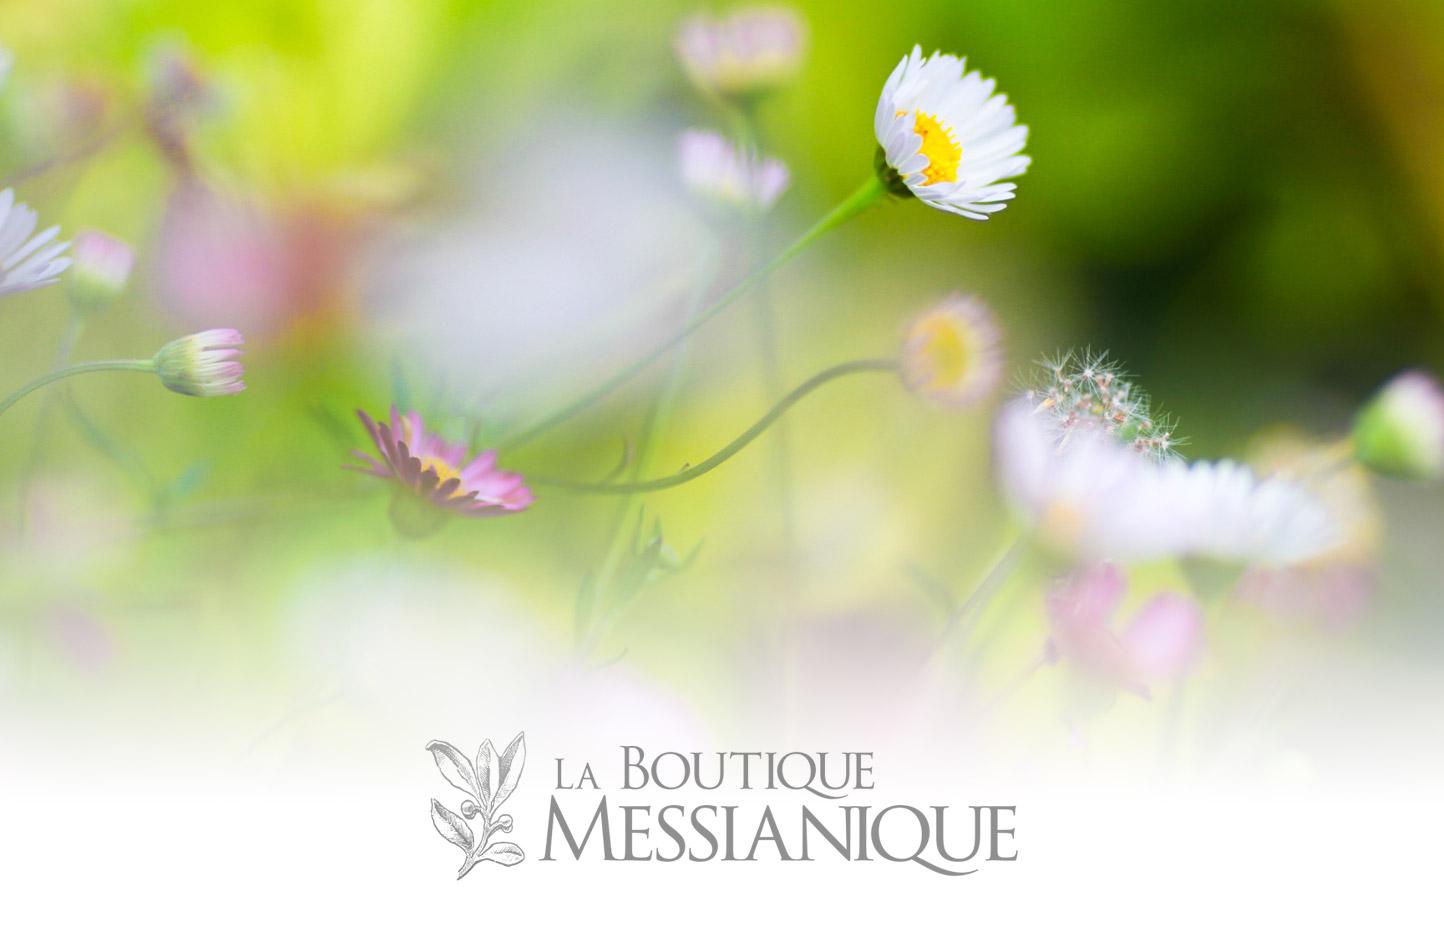 sublime-digital_boutique-messianique-logo-header